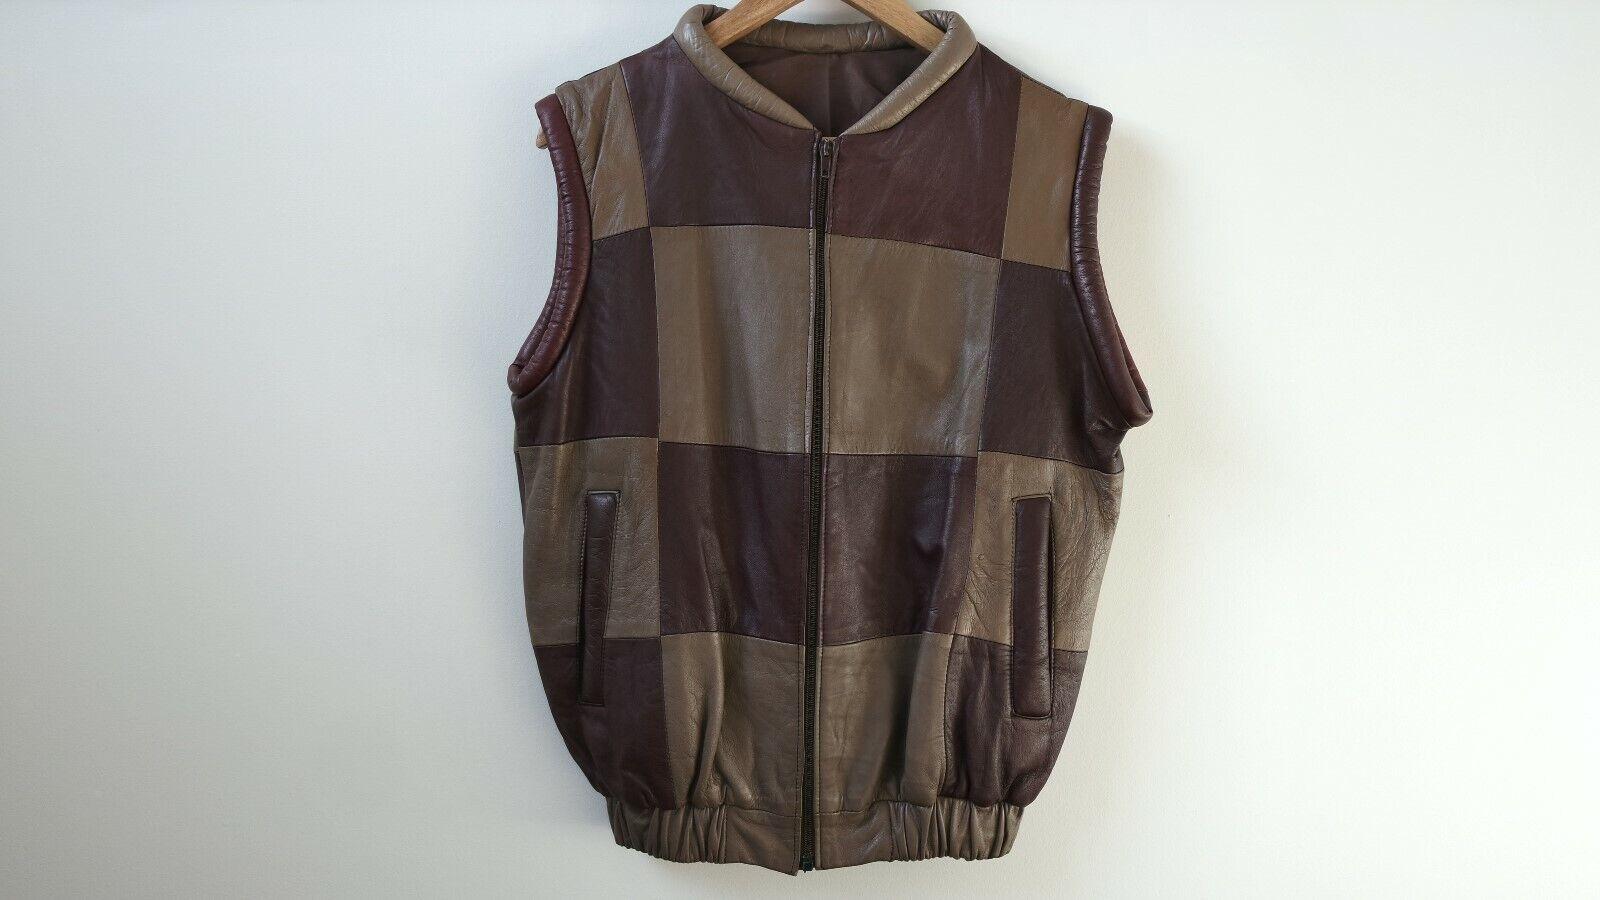 damen braun Leather Vest Größe S - Pre-Owned